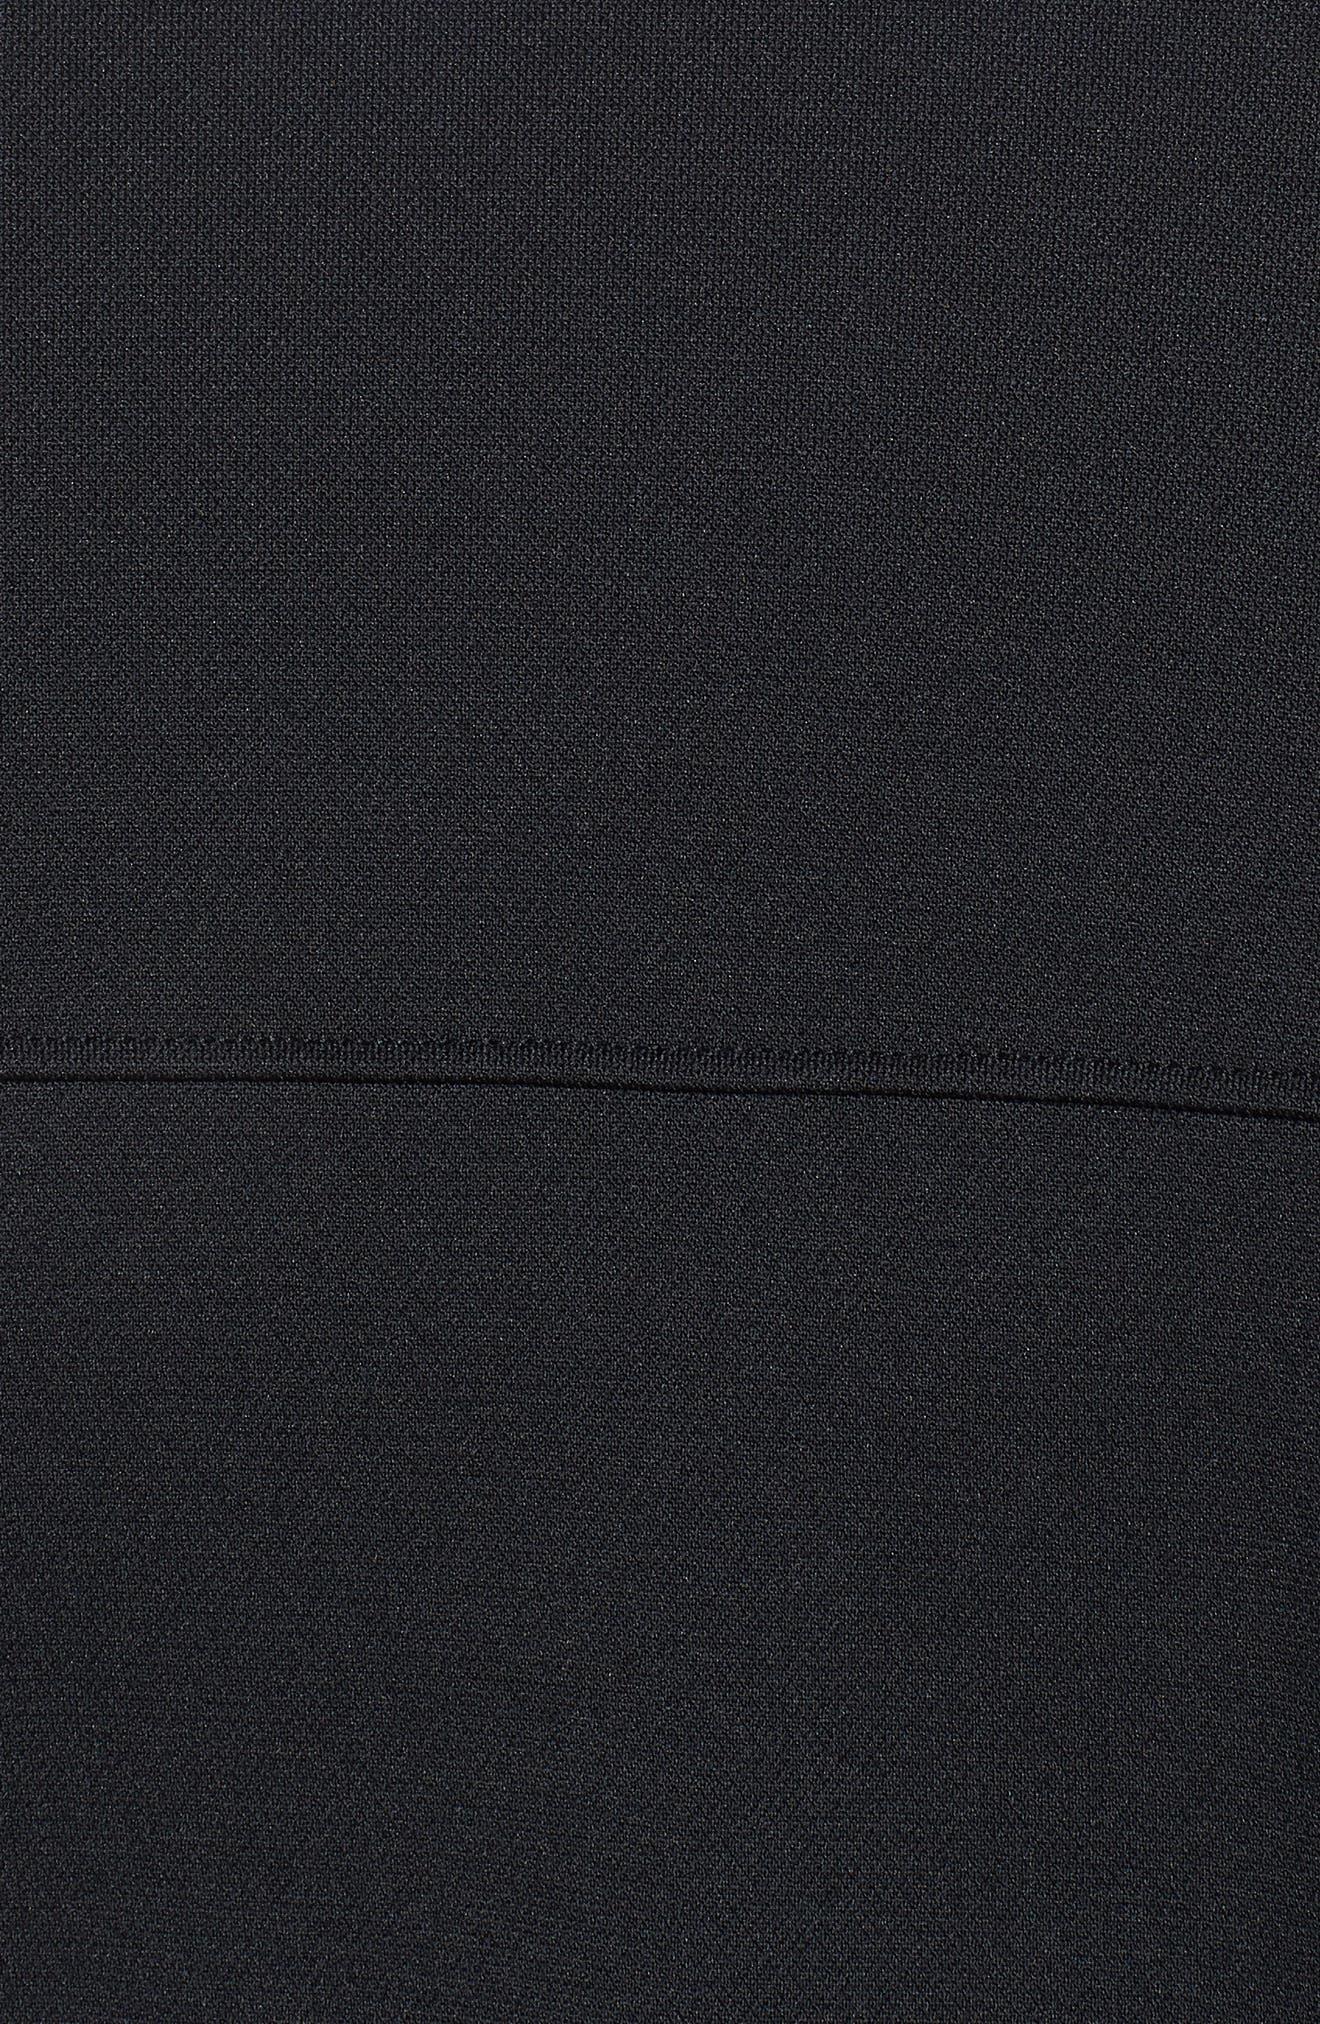 Sportstyle Piqué Track Jacket,                             Alternate thumbnail 7, color,                             BLACK / / BLACK